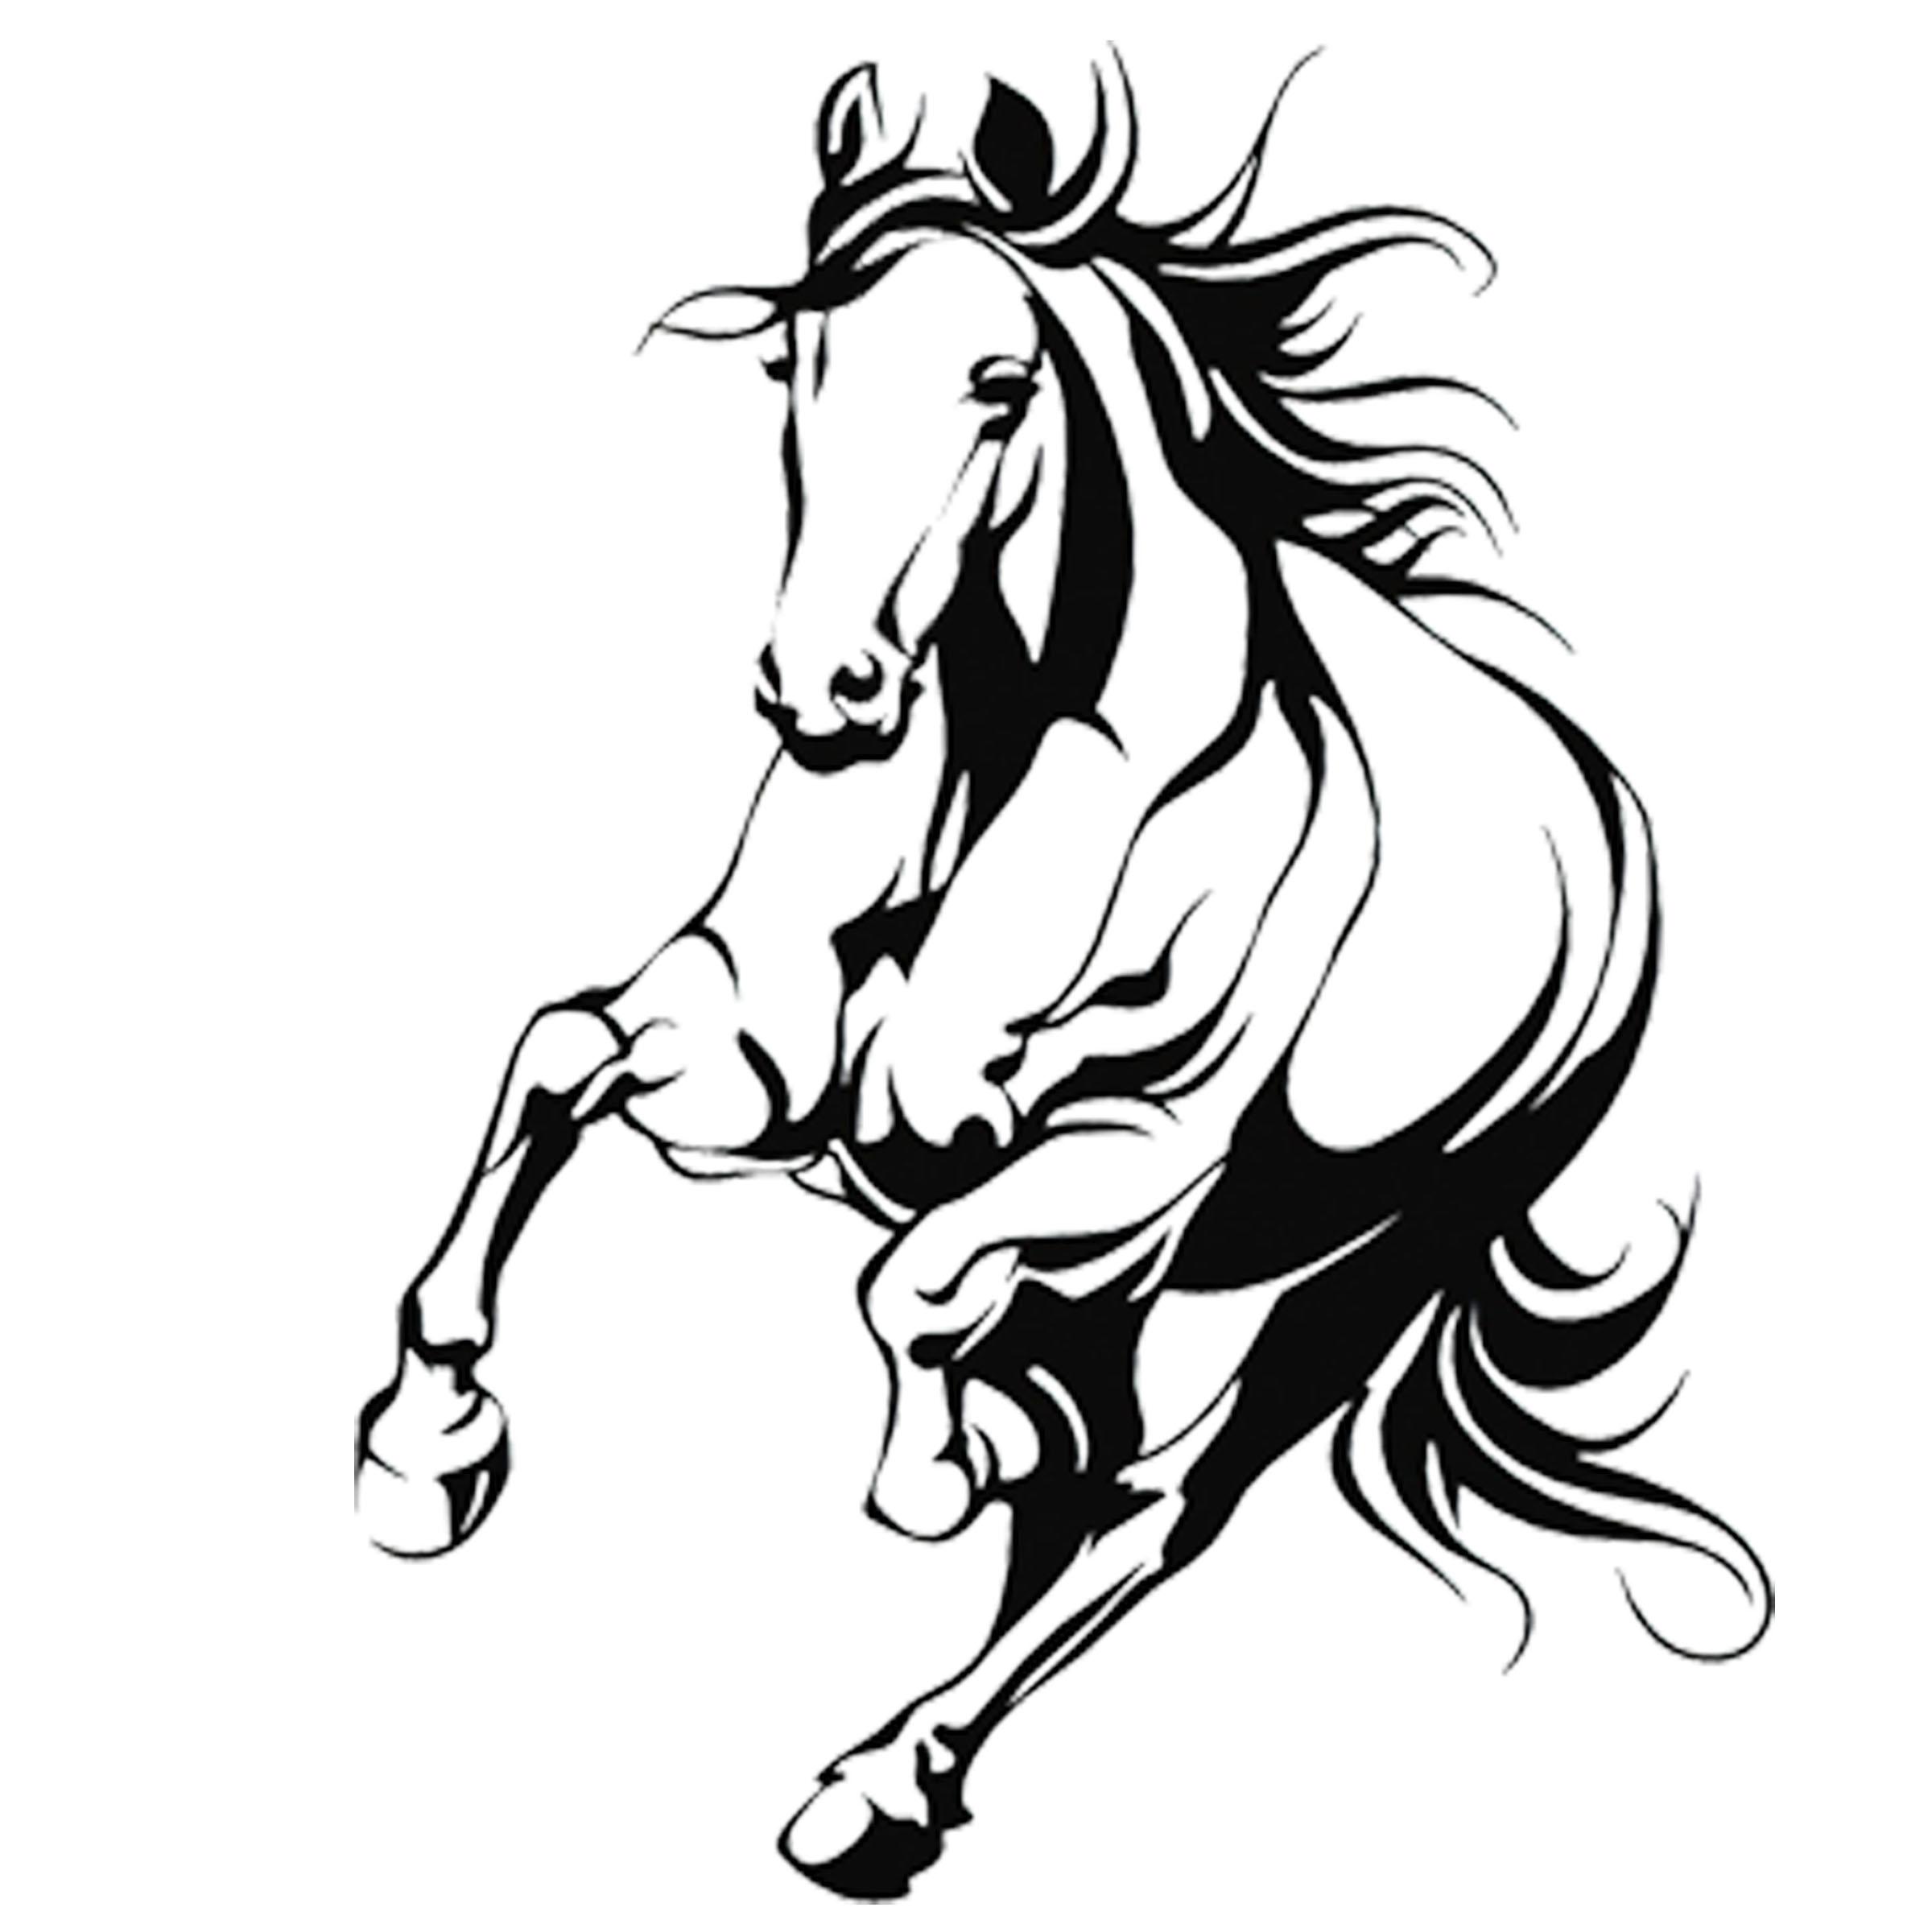 Decor Horse